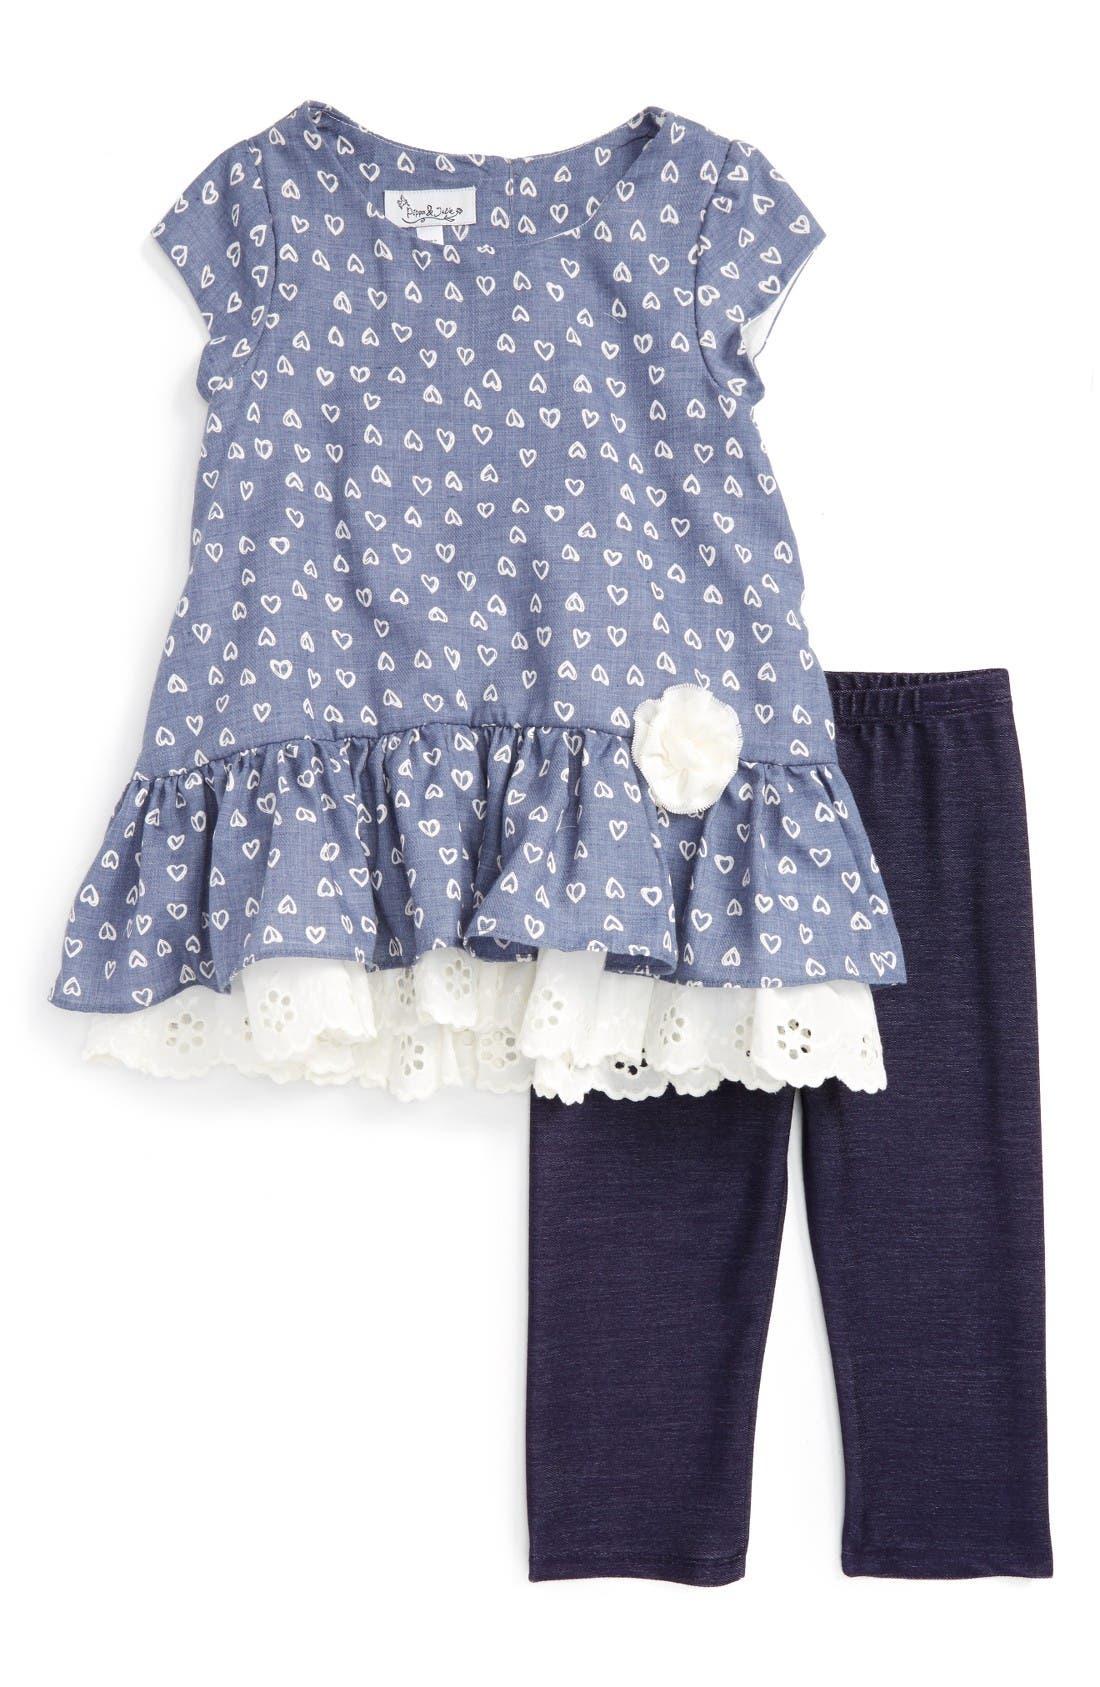 Alternate Image 1 Selected - Pippa & Julie Peplum Tunic & Leggings Set (Toddler Girls & Little Girls)